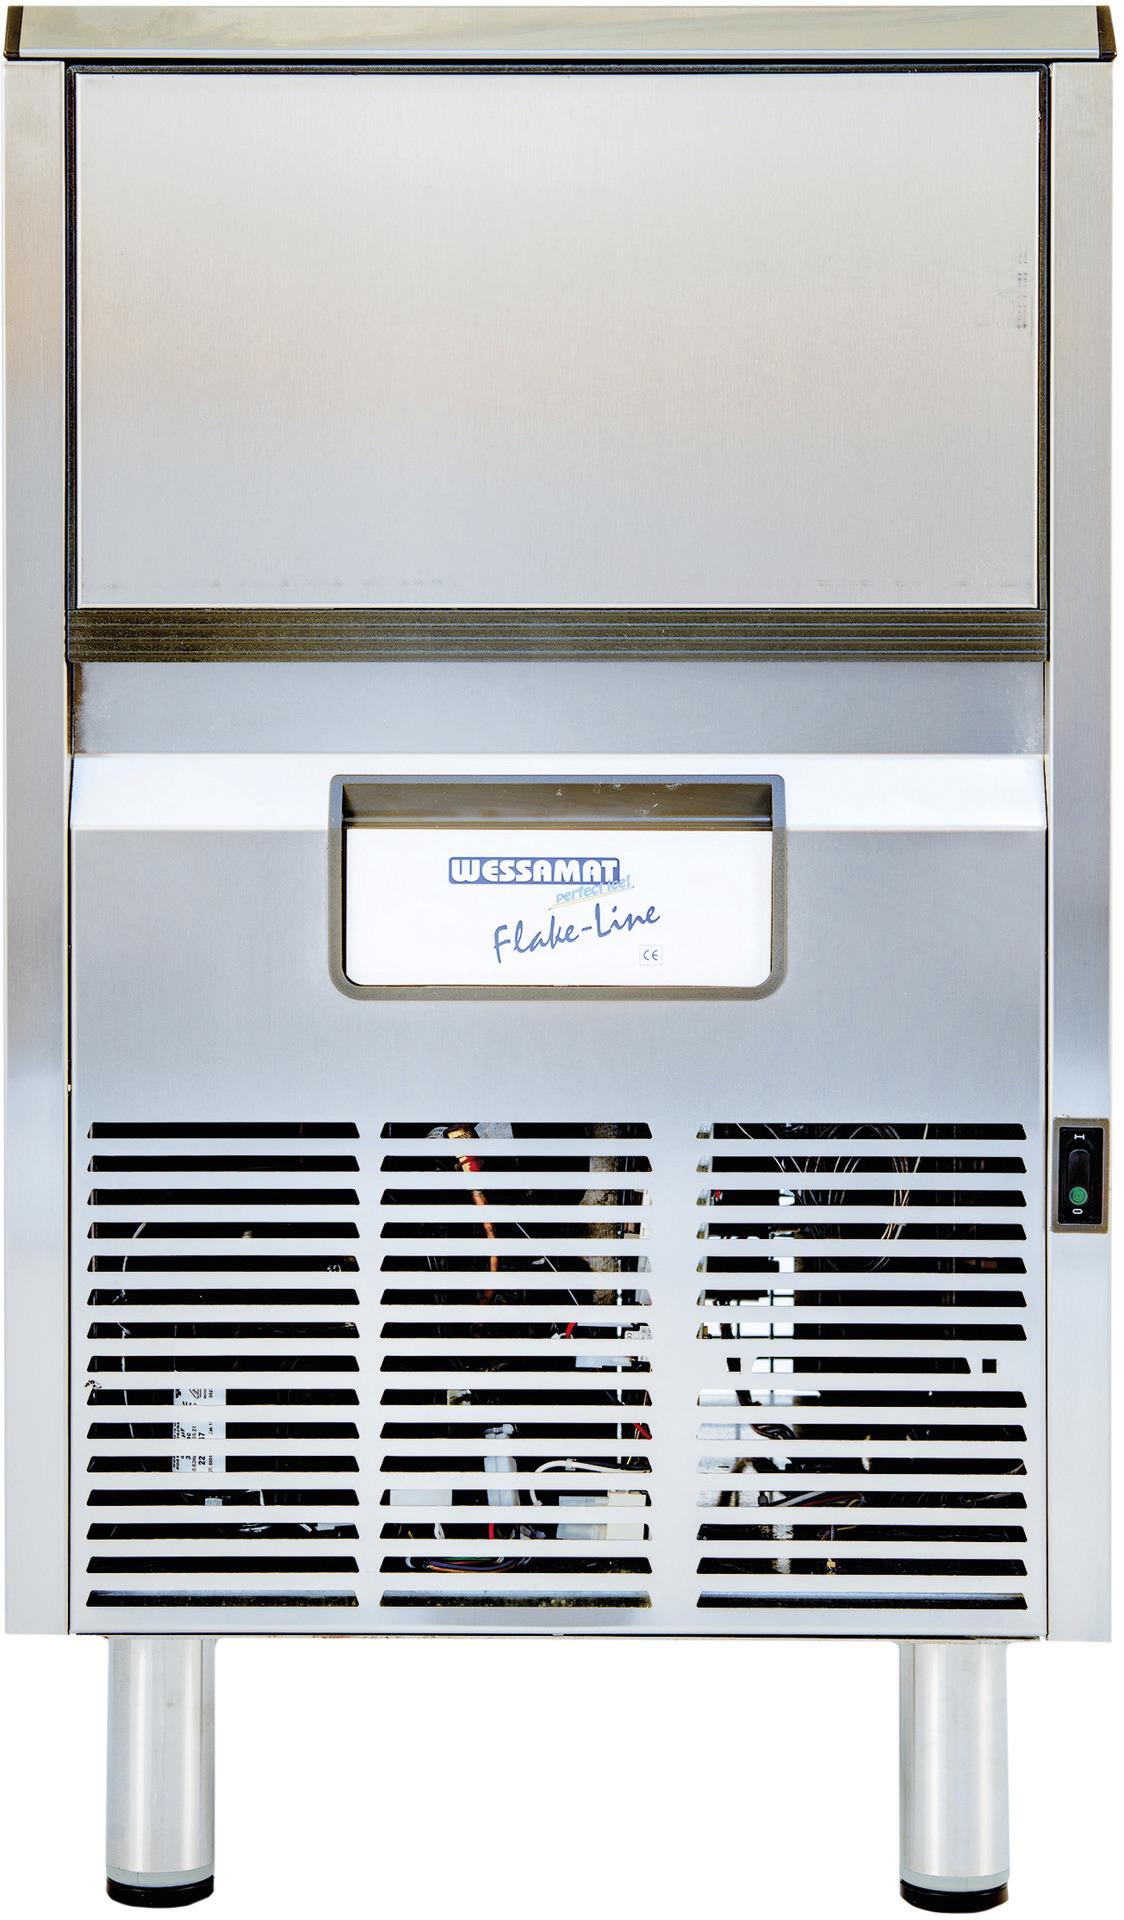 Nuggeteisbereiter NF 125 L/125,00 kg/24h / 42,00 kg Vorrat / Luftkühlung